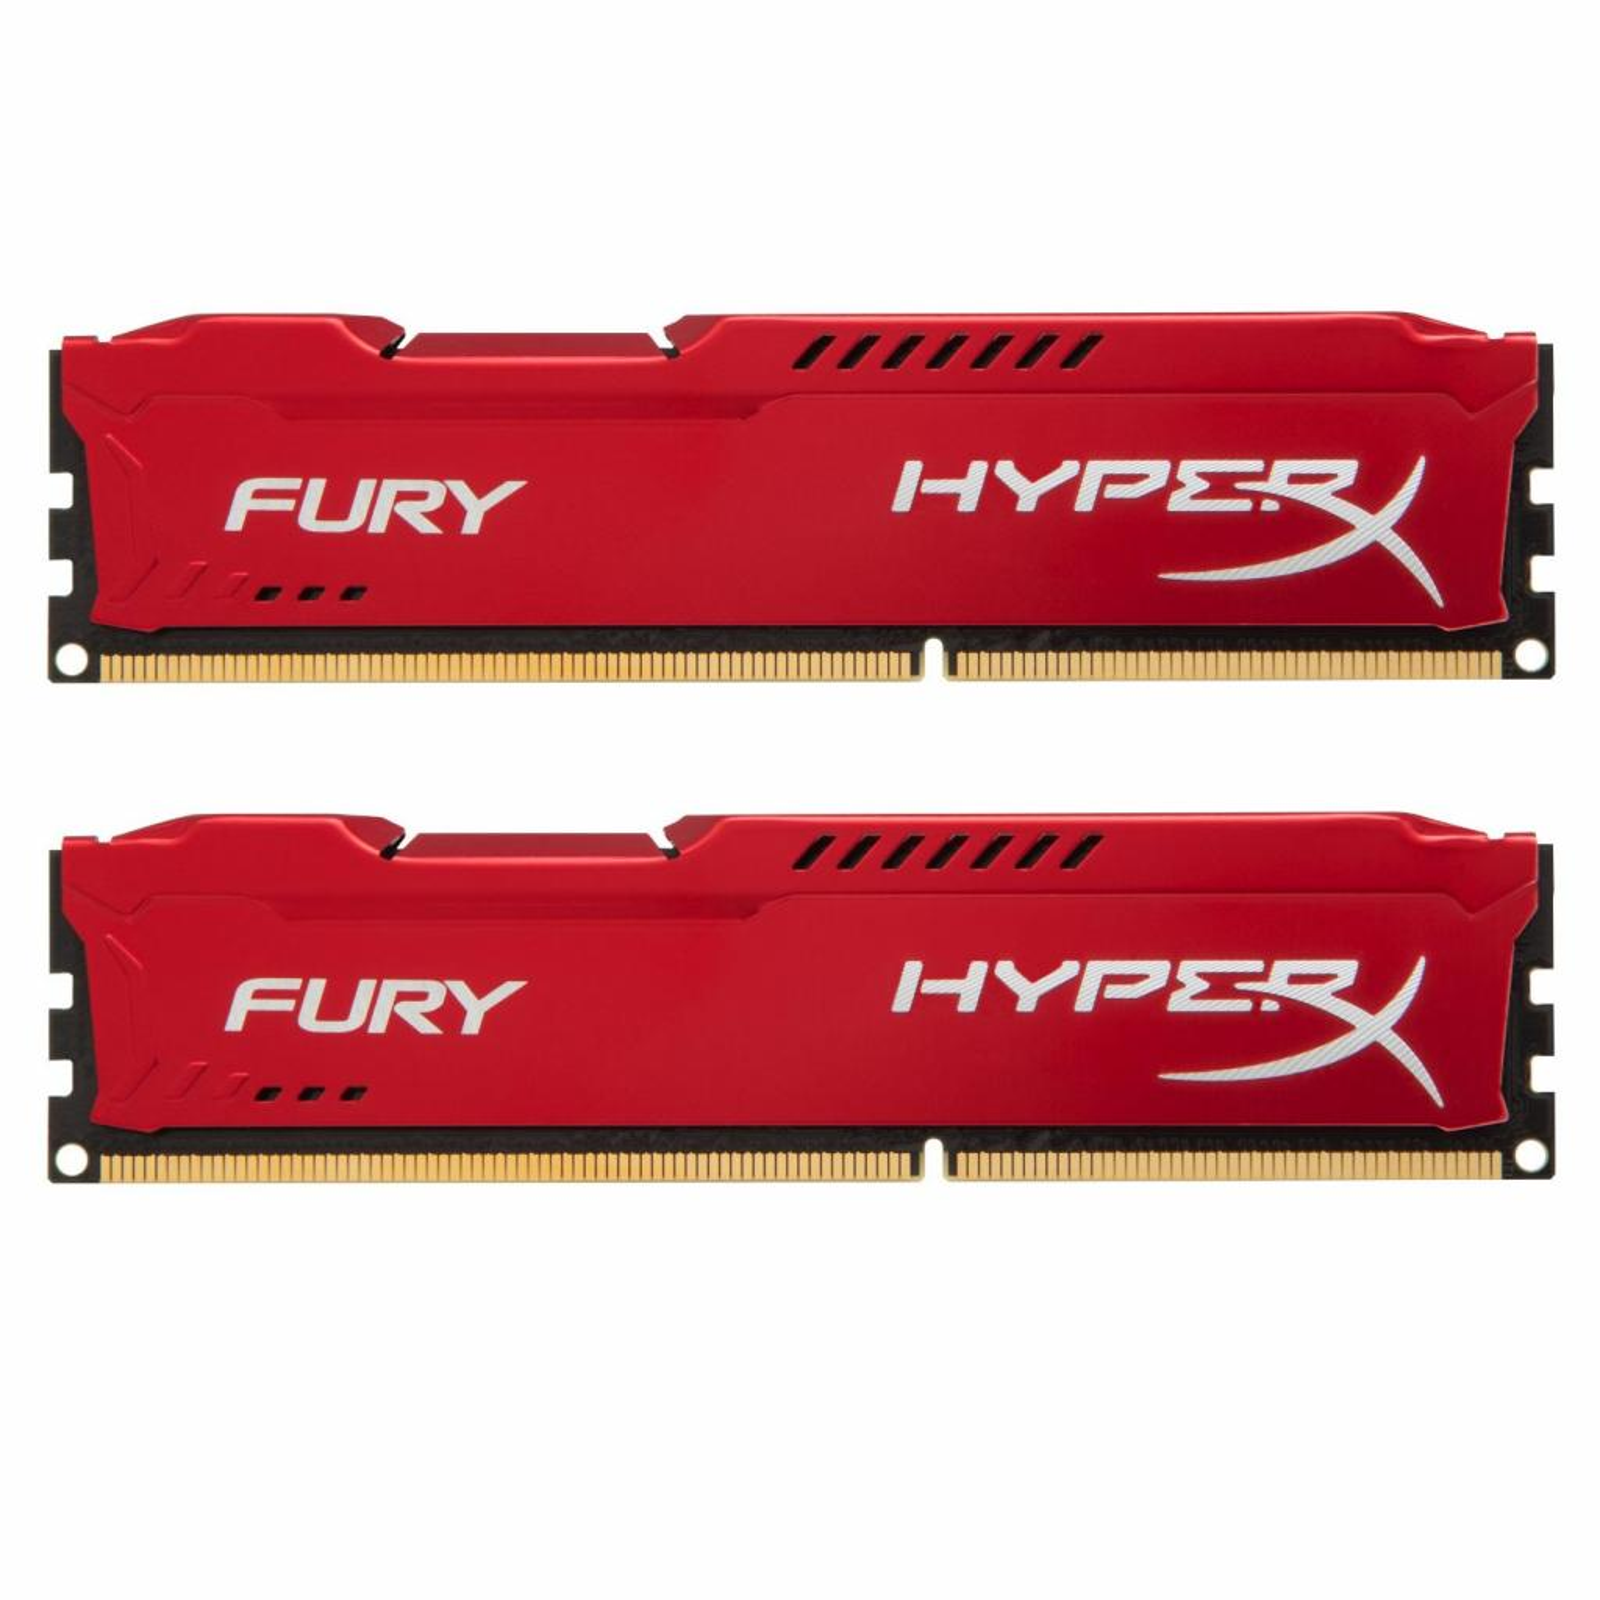 Модуль памяти для компьютера DDR3 16Gb (2x8GB) 1600 MHz HyperX Fury Red Kingston (HX316C10FRK2/16)